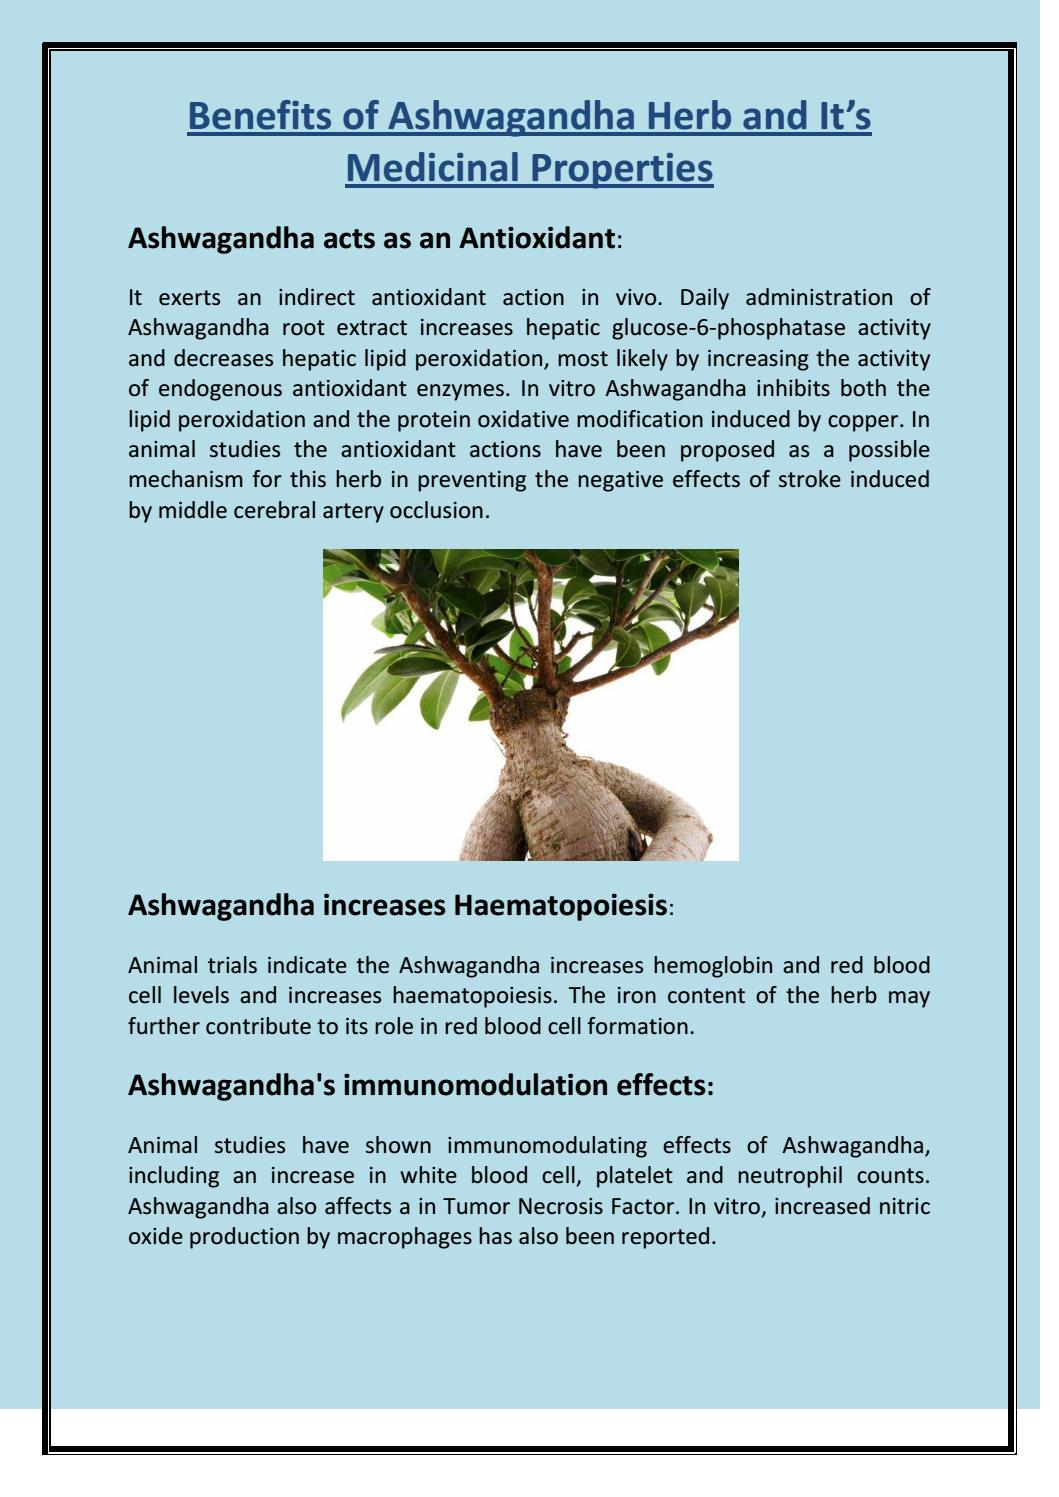 Benefits of ashwagandha herb and it's medicinal properties